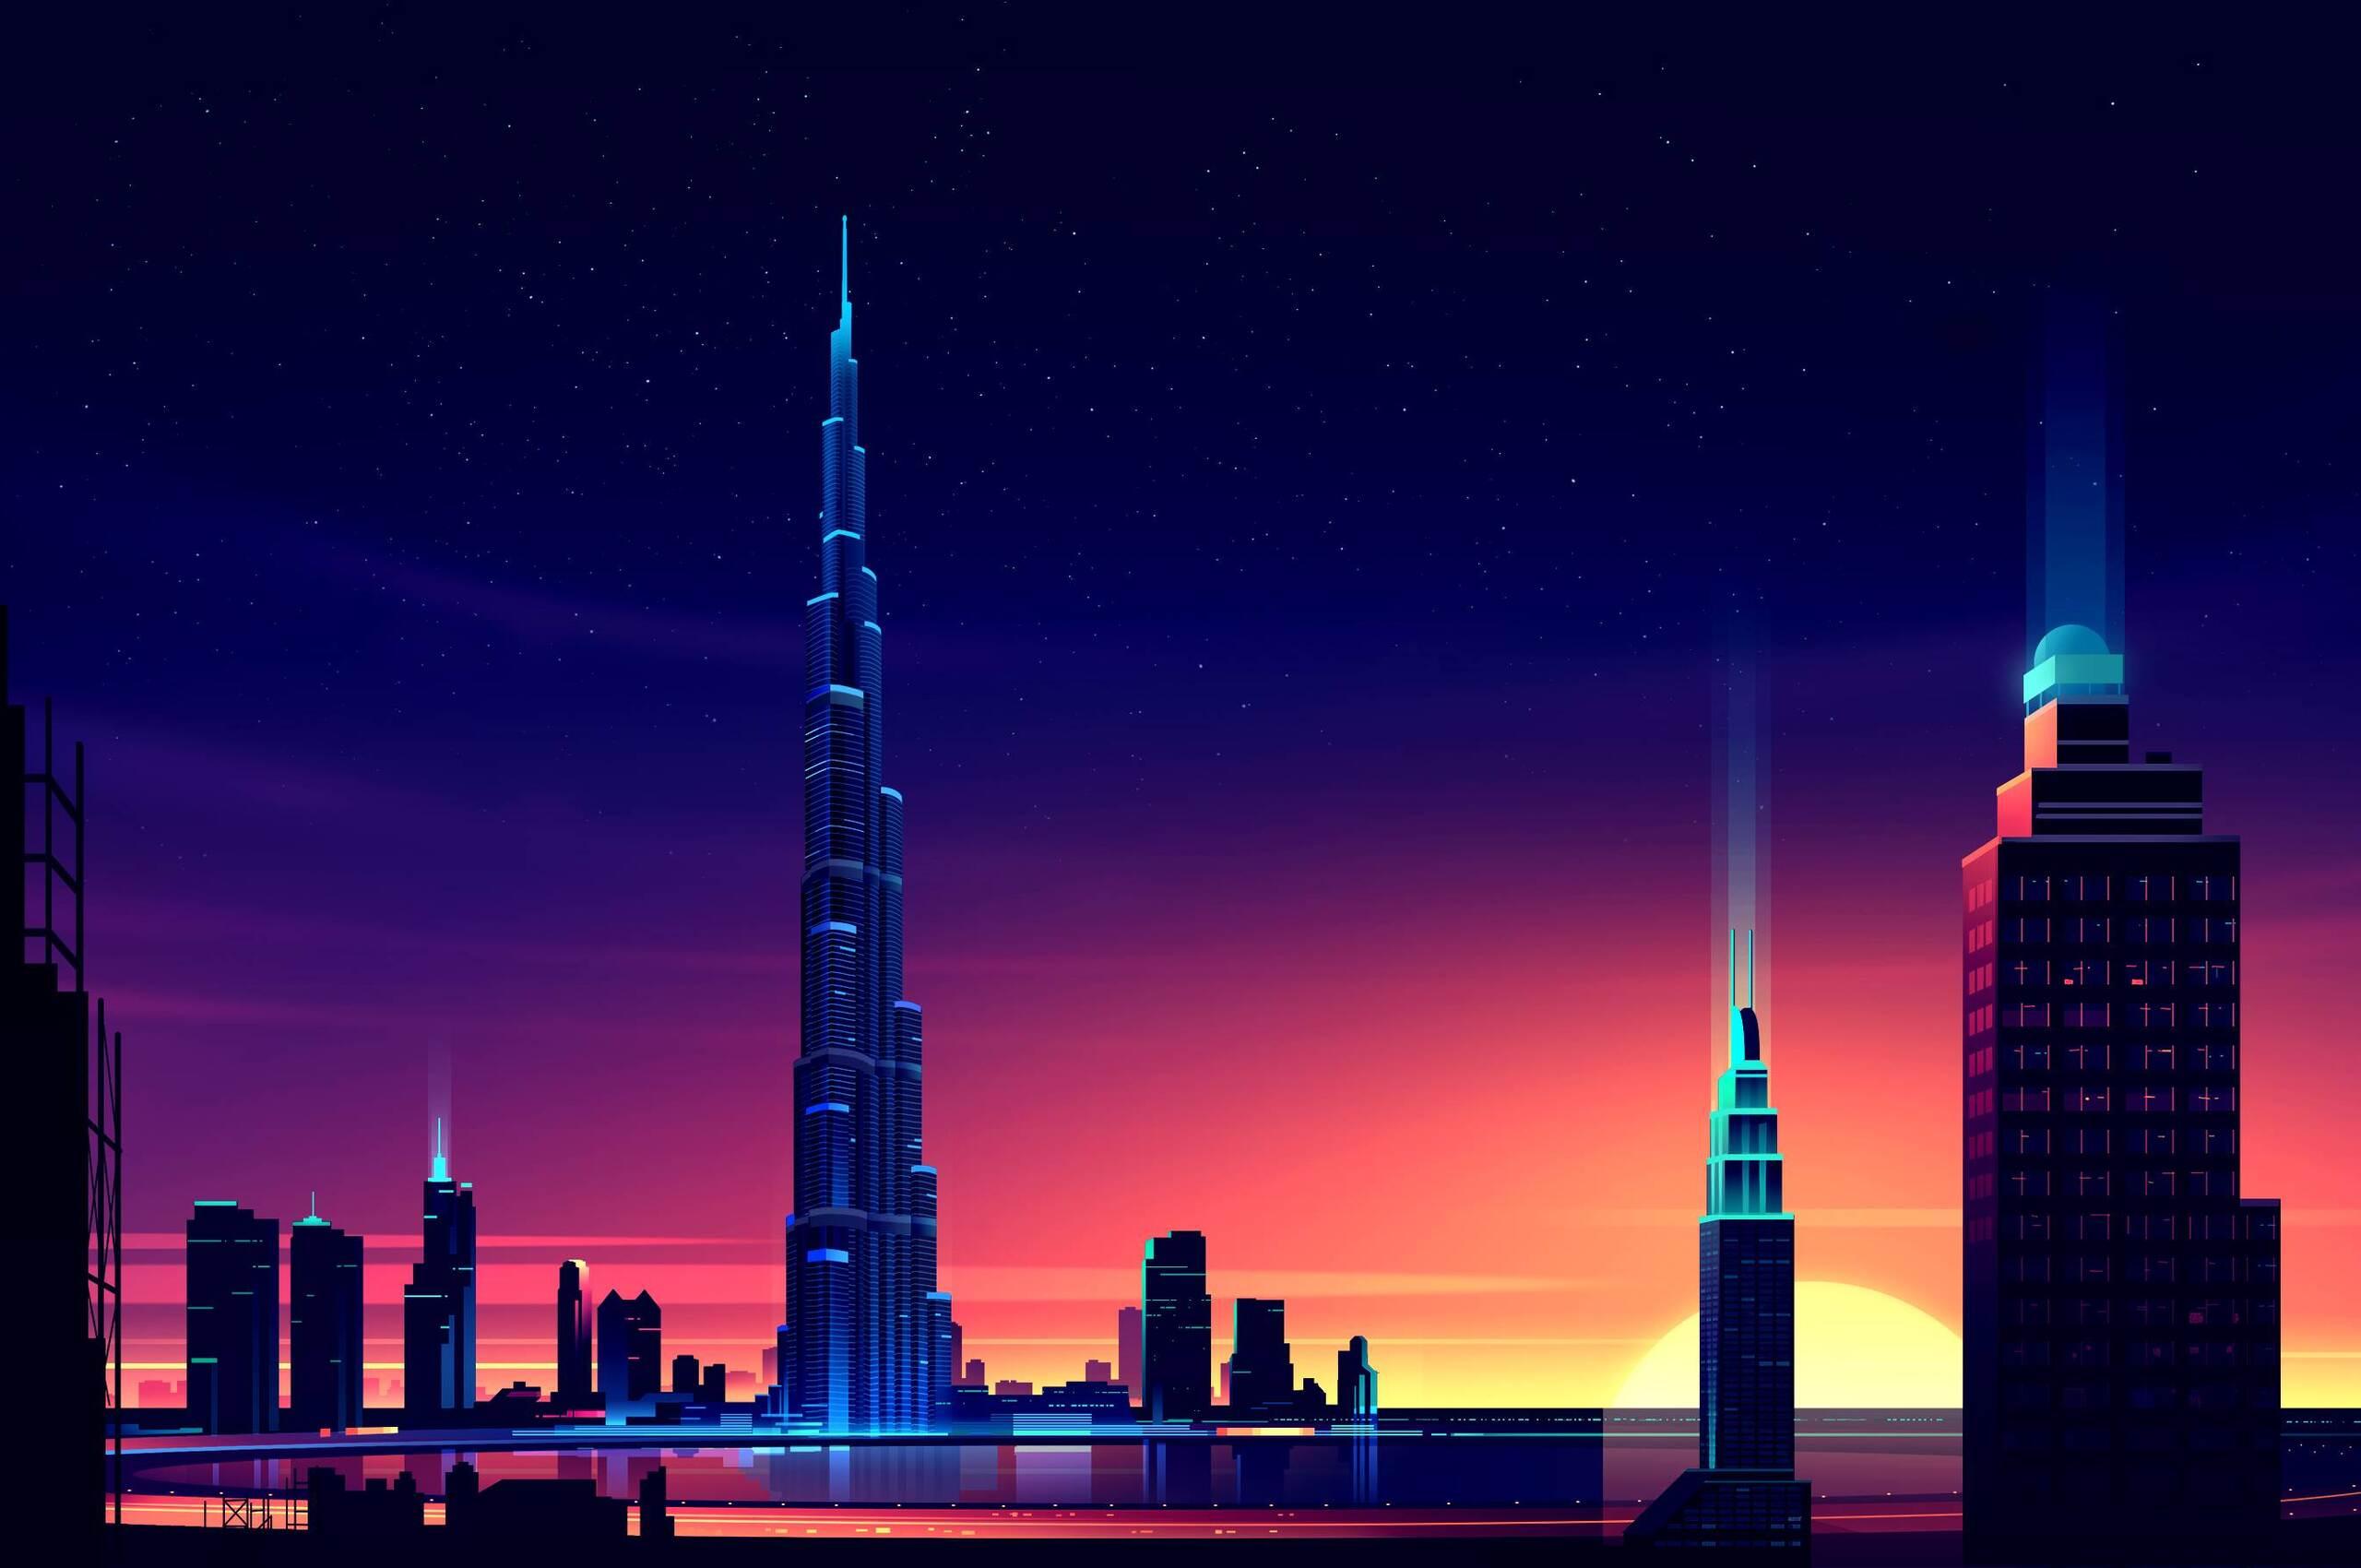 2560x1700 dubai burj khalifa minimalist chromebook pixel hd 4k wallpapers images backgrounds - Dubai burj khalifa hd photos ...